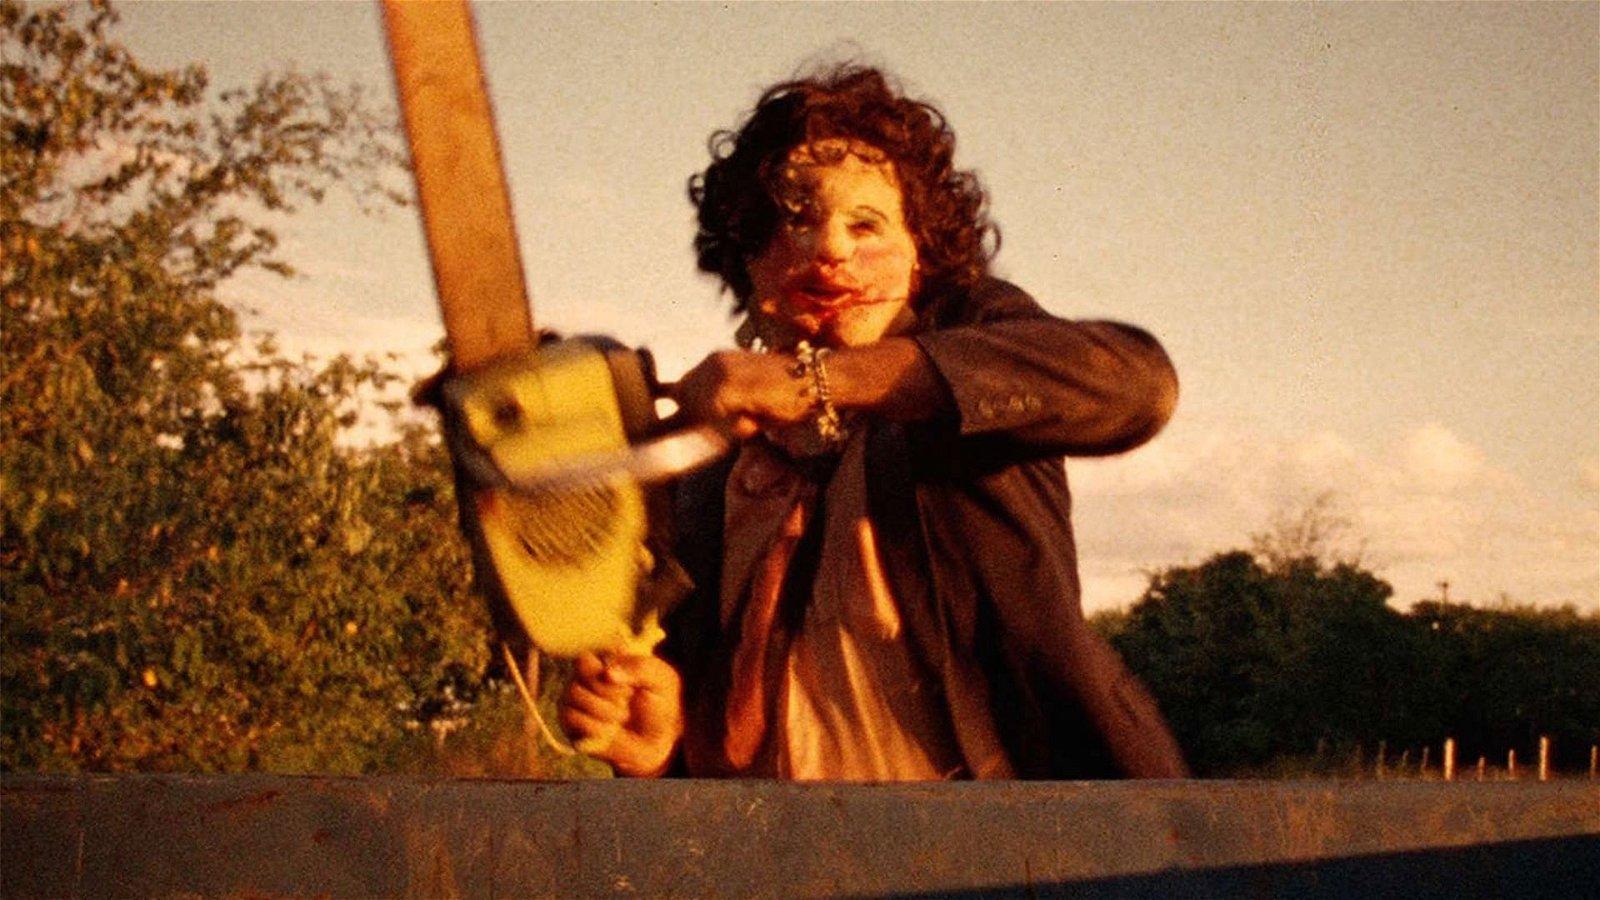 Fede Álvarez To Produce Next Texas Chainsaw Massacre 3